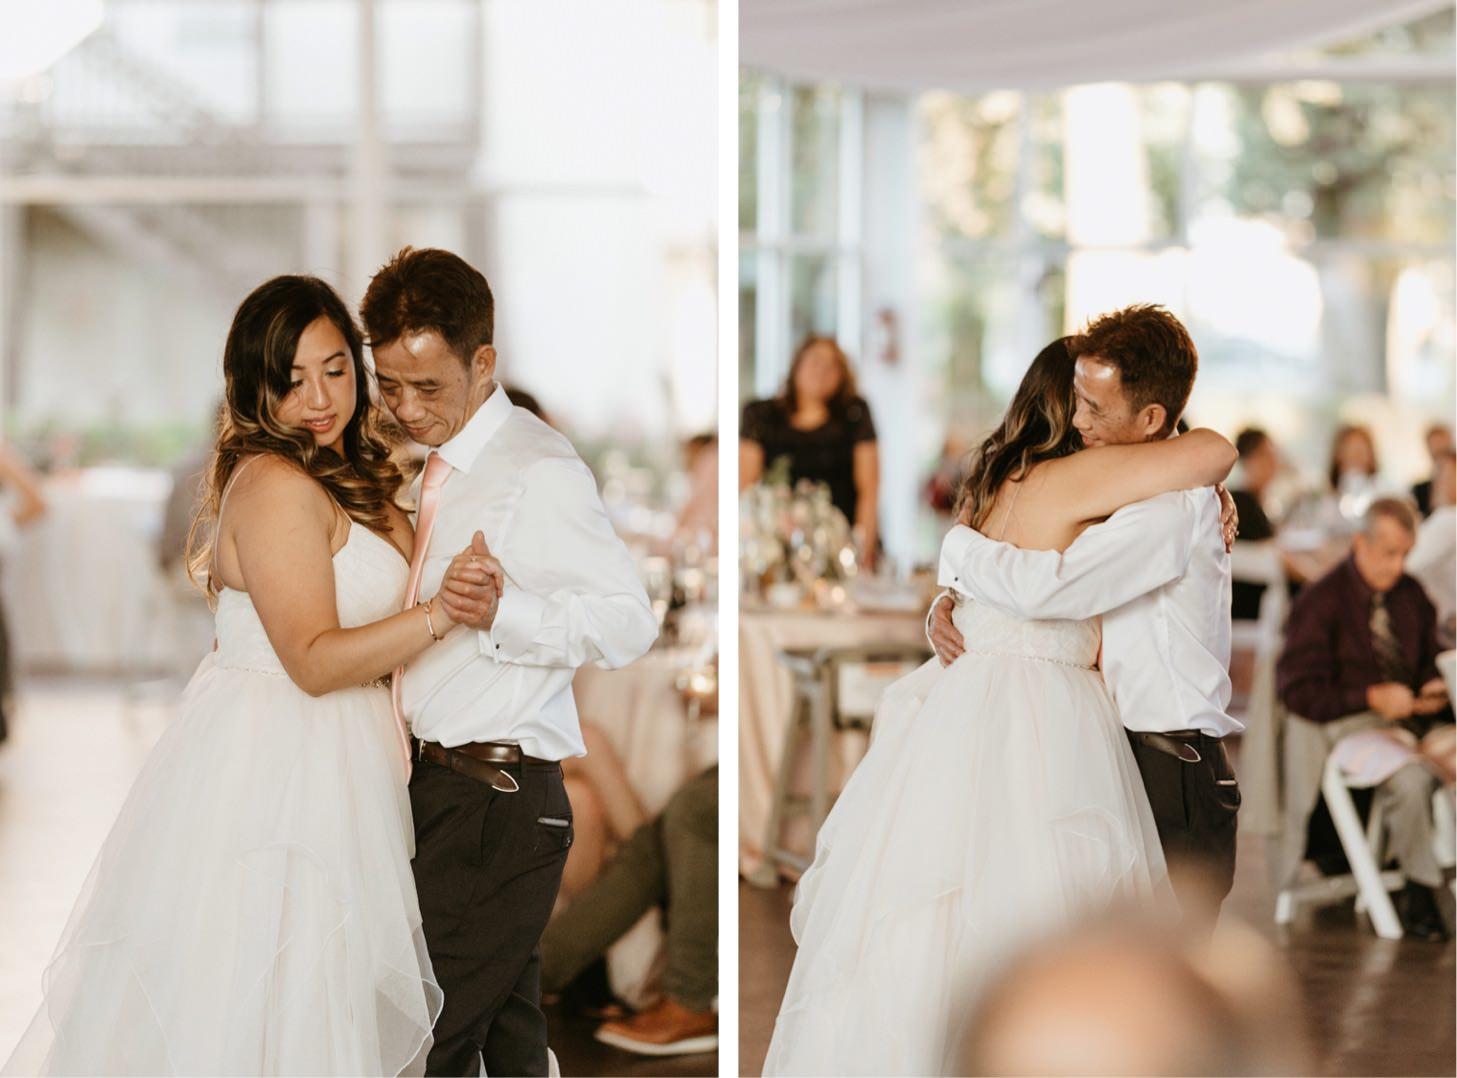 ritz-charles-wedding-reception-downtown-indianapolis-wedding-photographer052.JPG